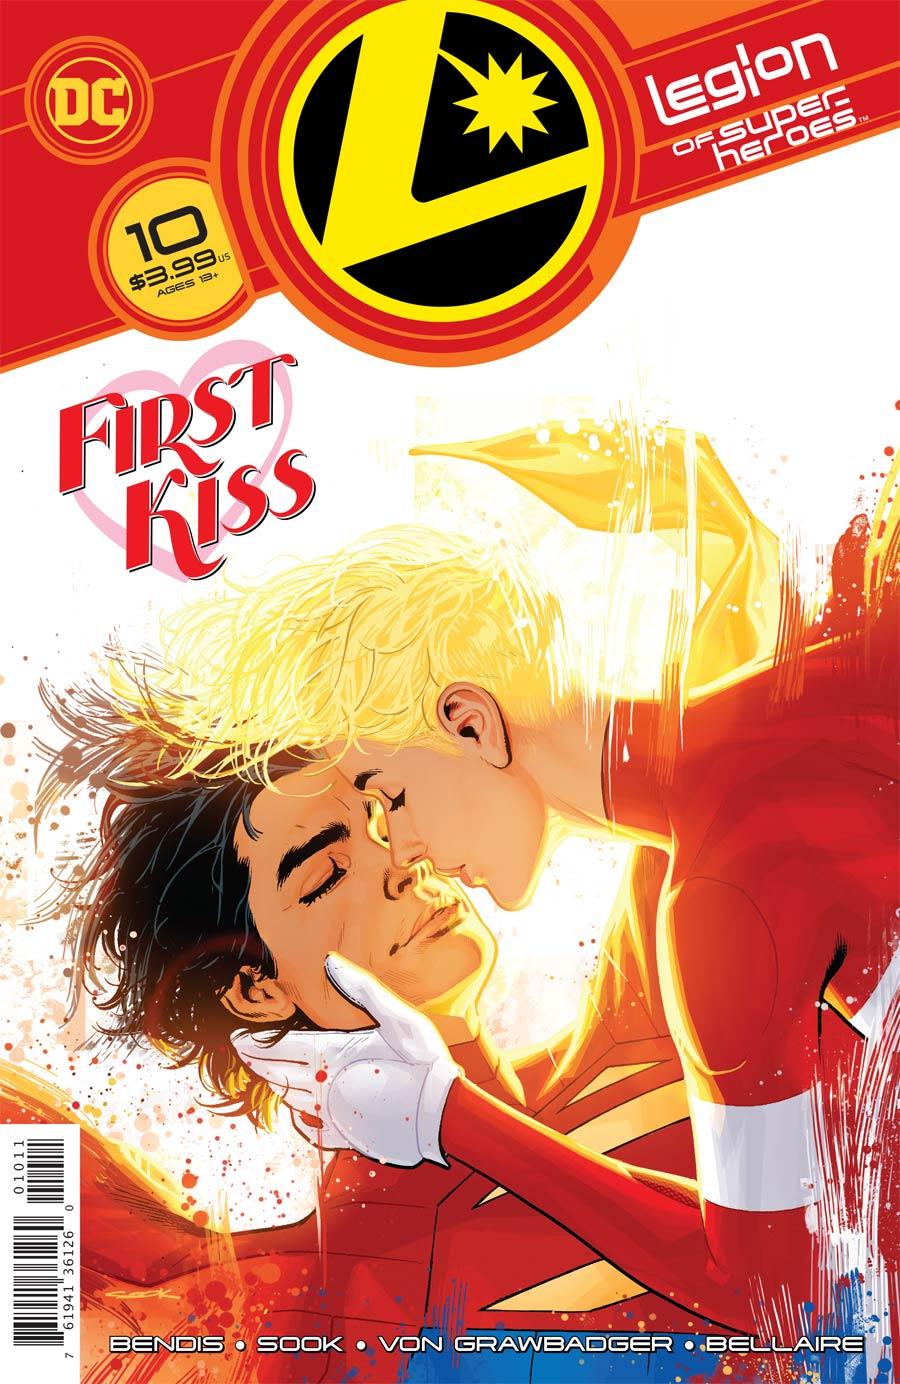 Legion Of Super-Heroes Vol 8 #10 Cover A Regular Ryan Sook Cover